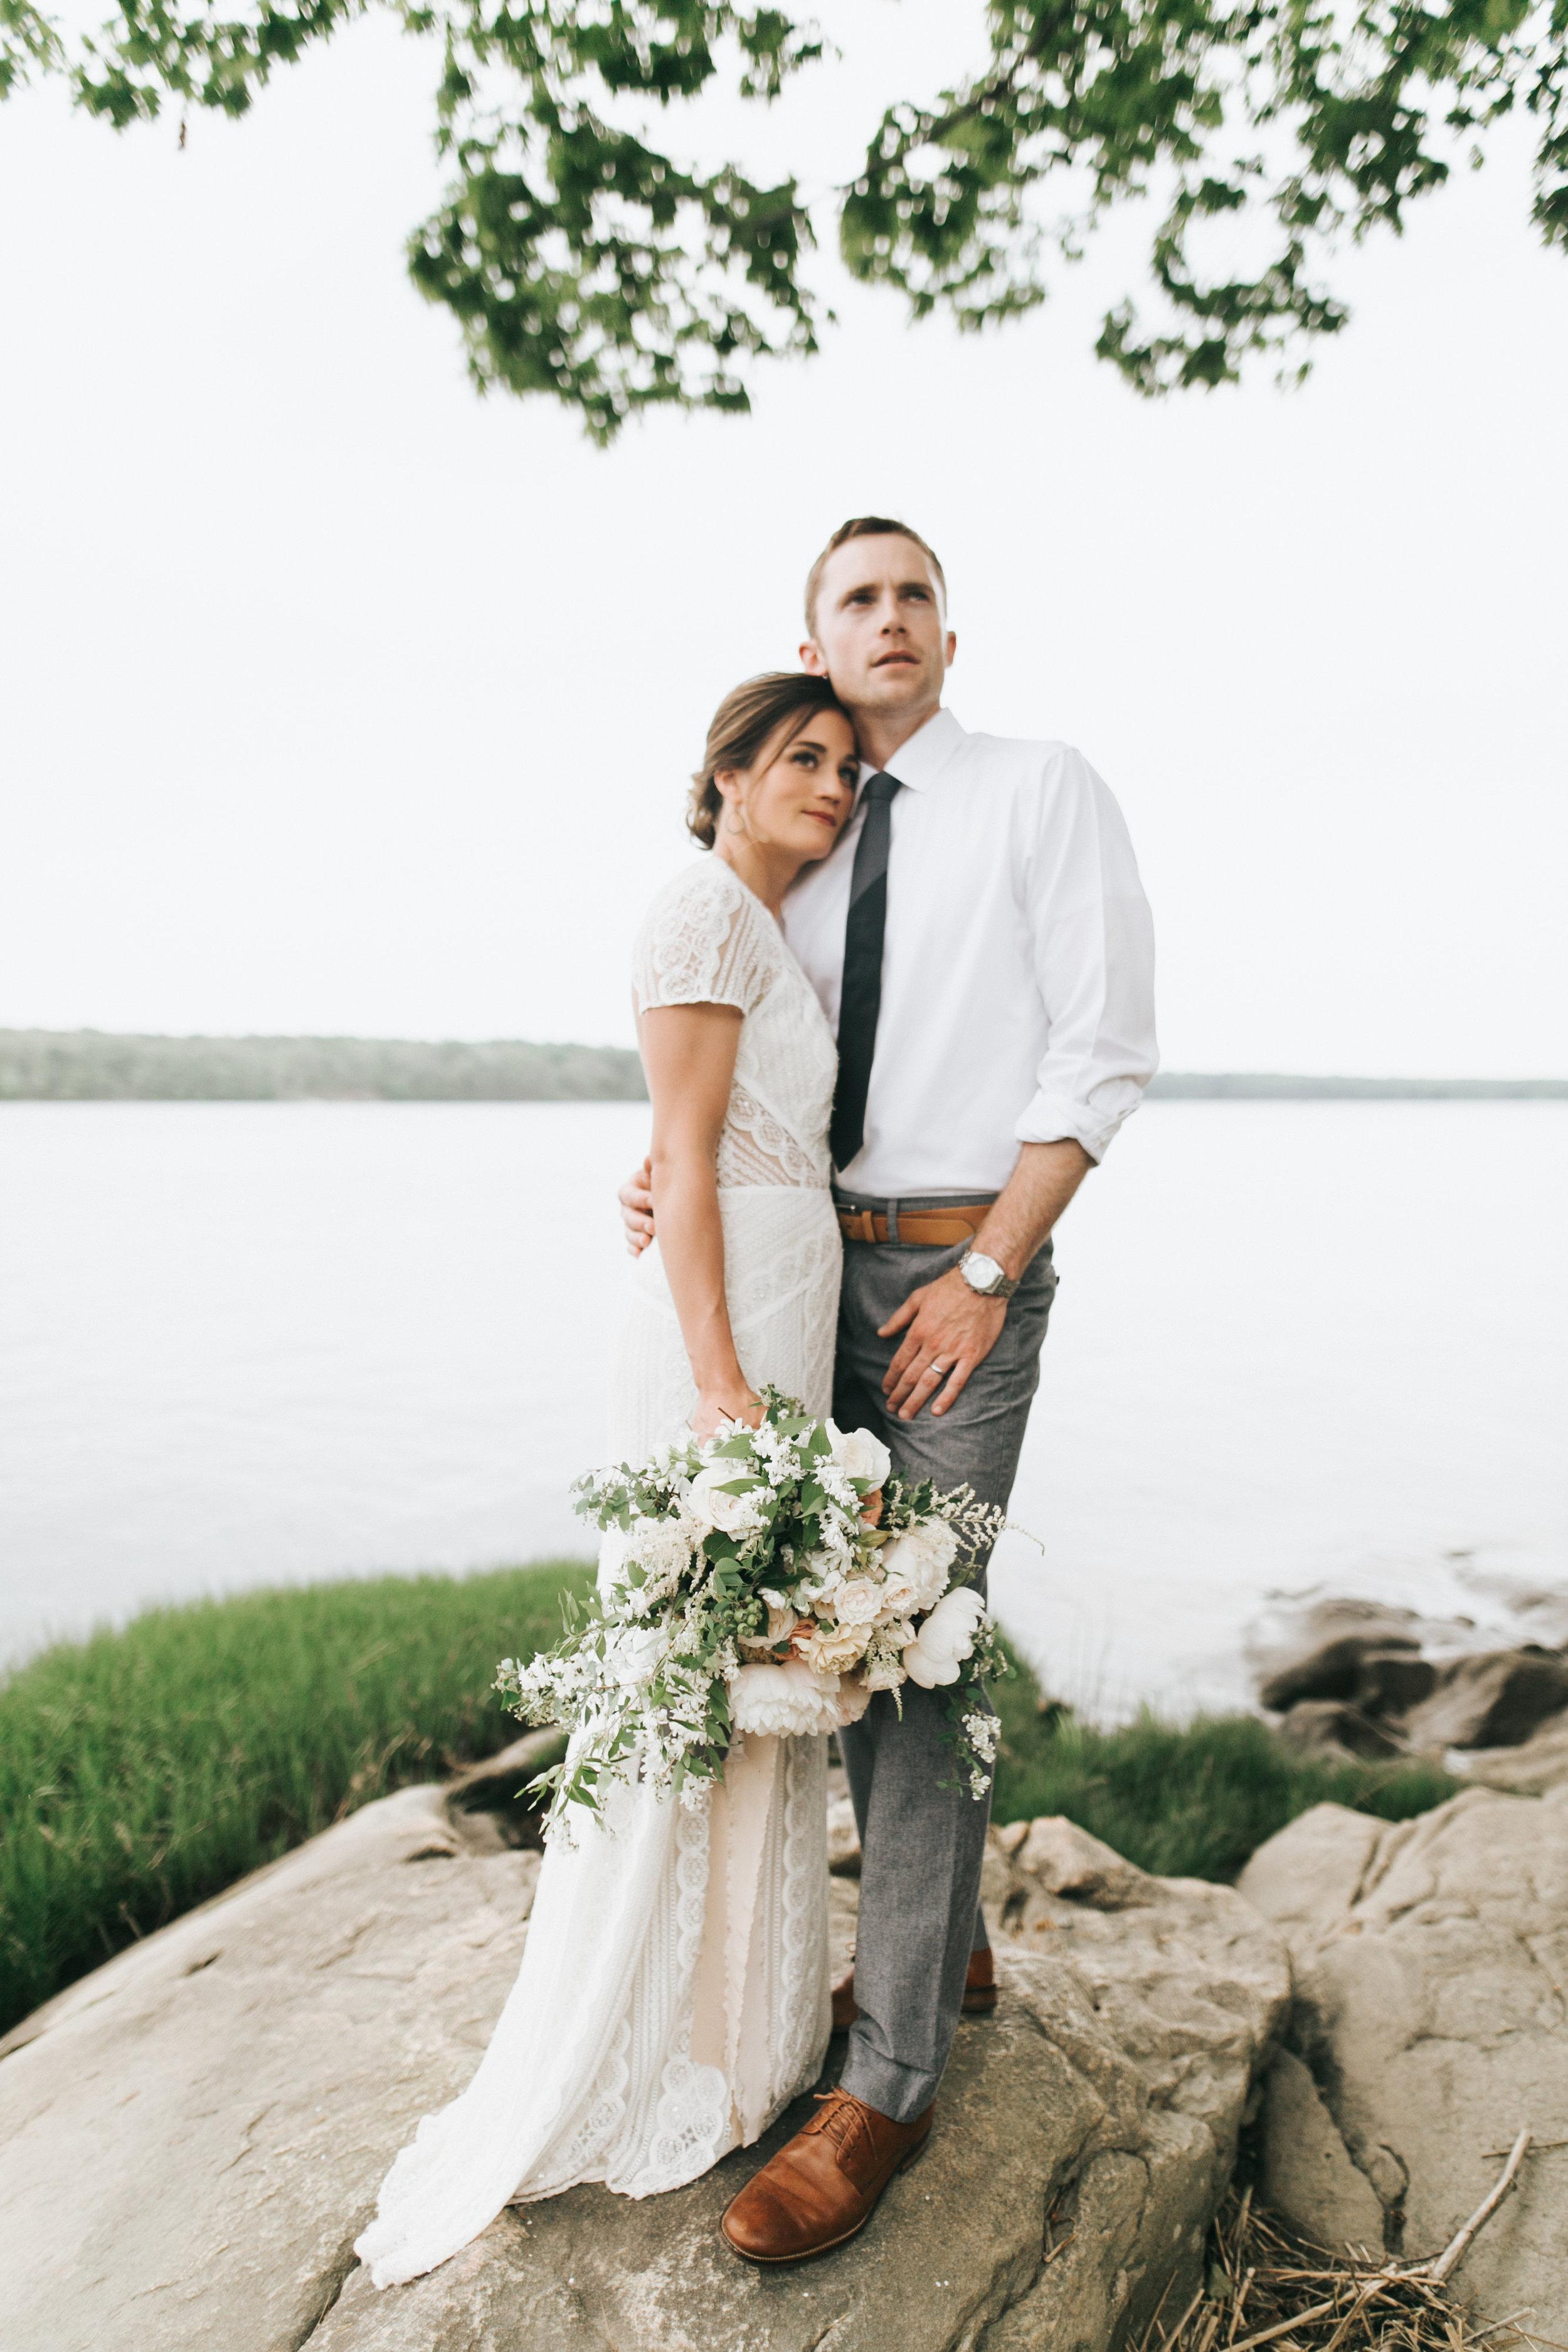 Watershed-Floral-Maine-Maritime-Wedding-Bridal-Bouquet-Centerpieces-0183.jpg